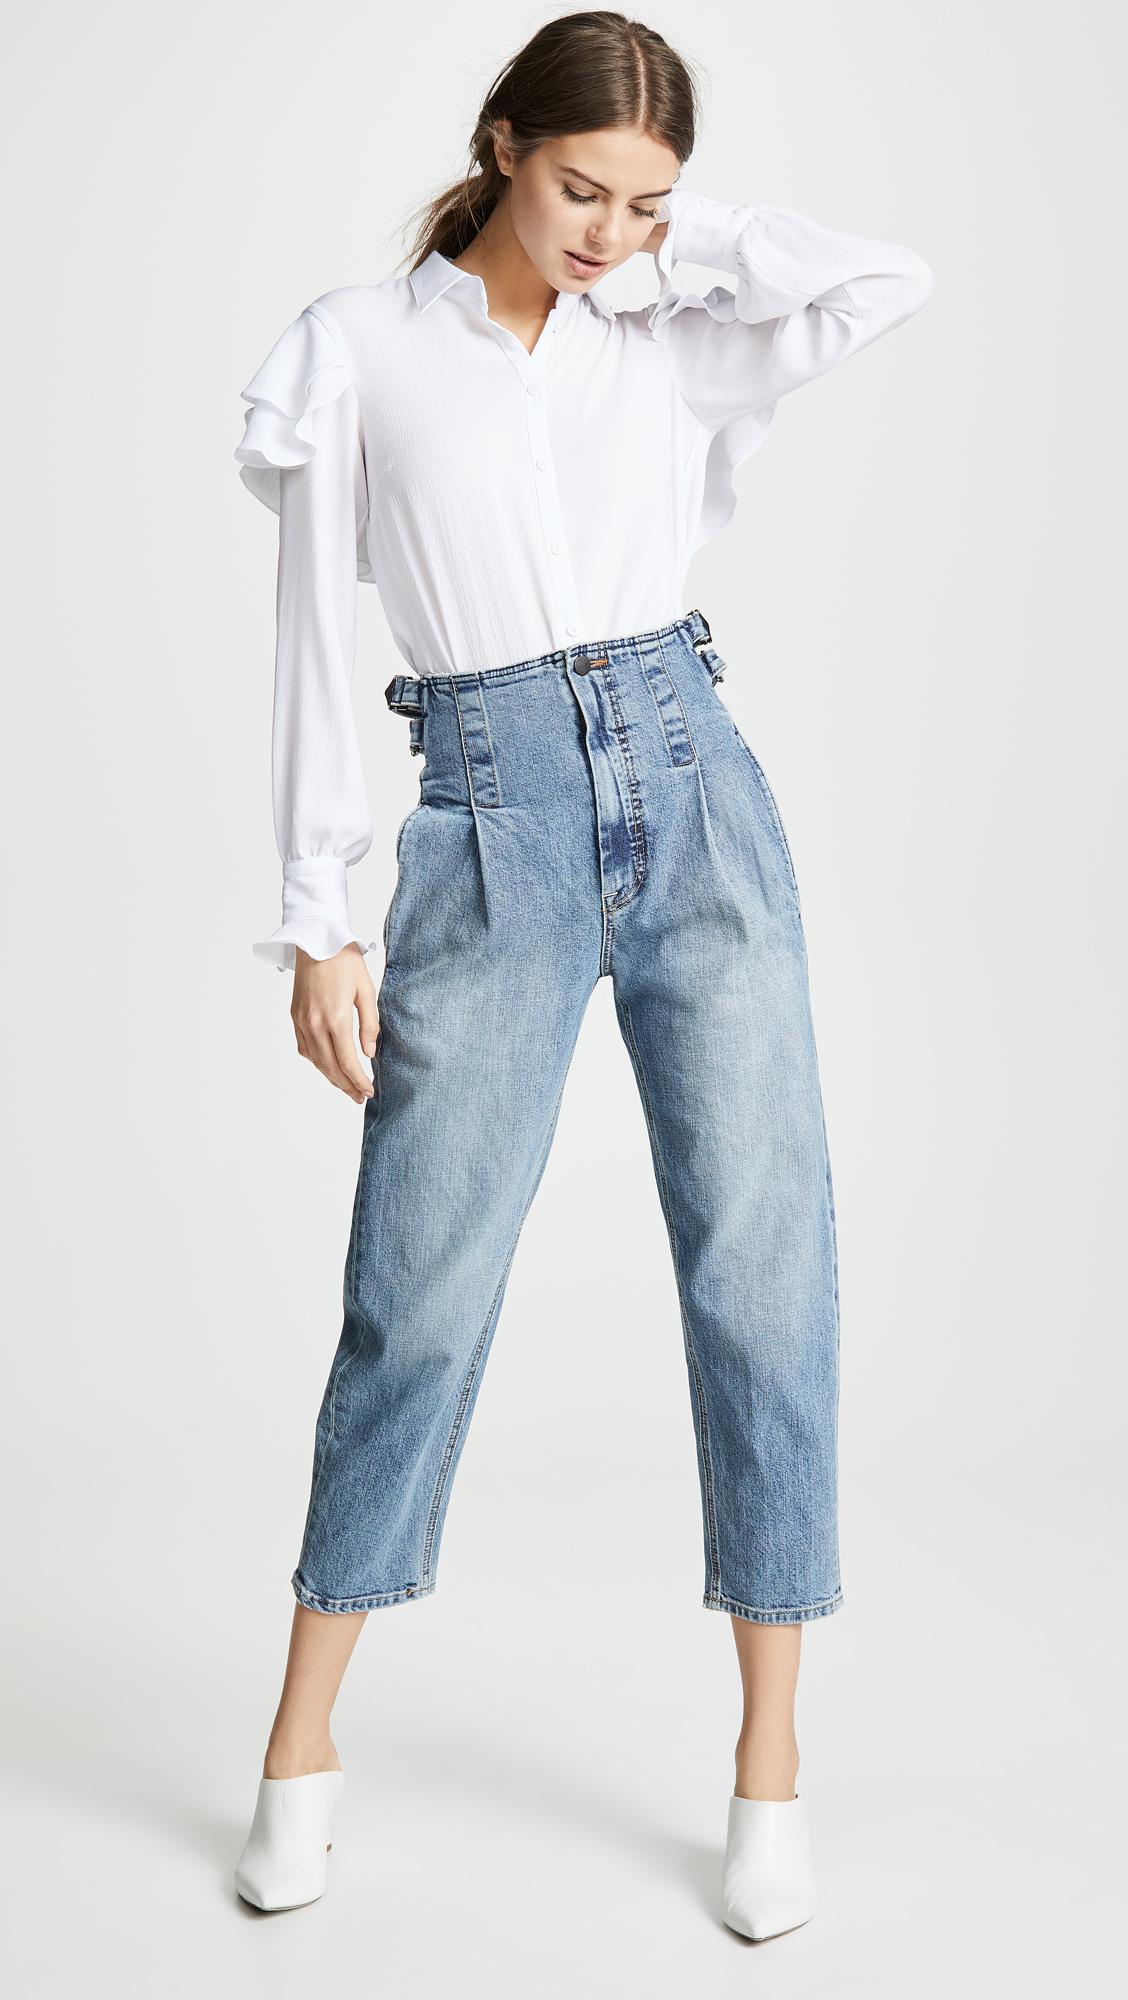 Colovos Vintage Buckle Pants